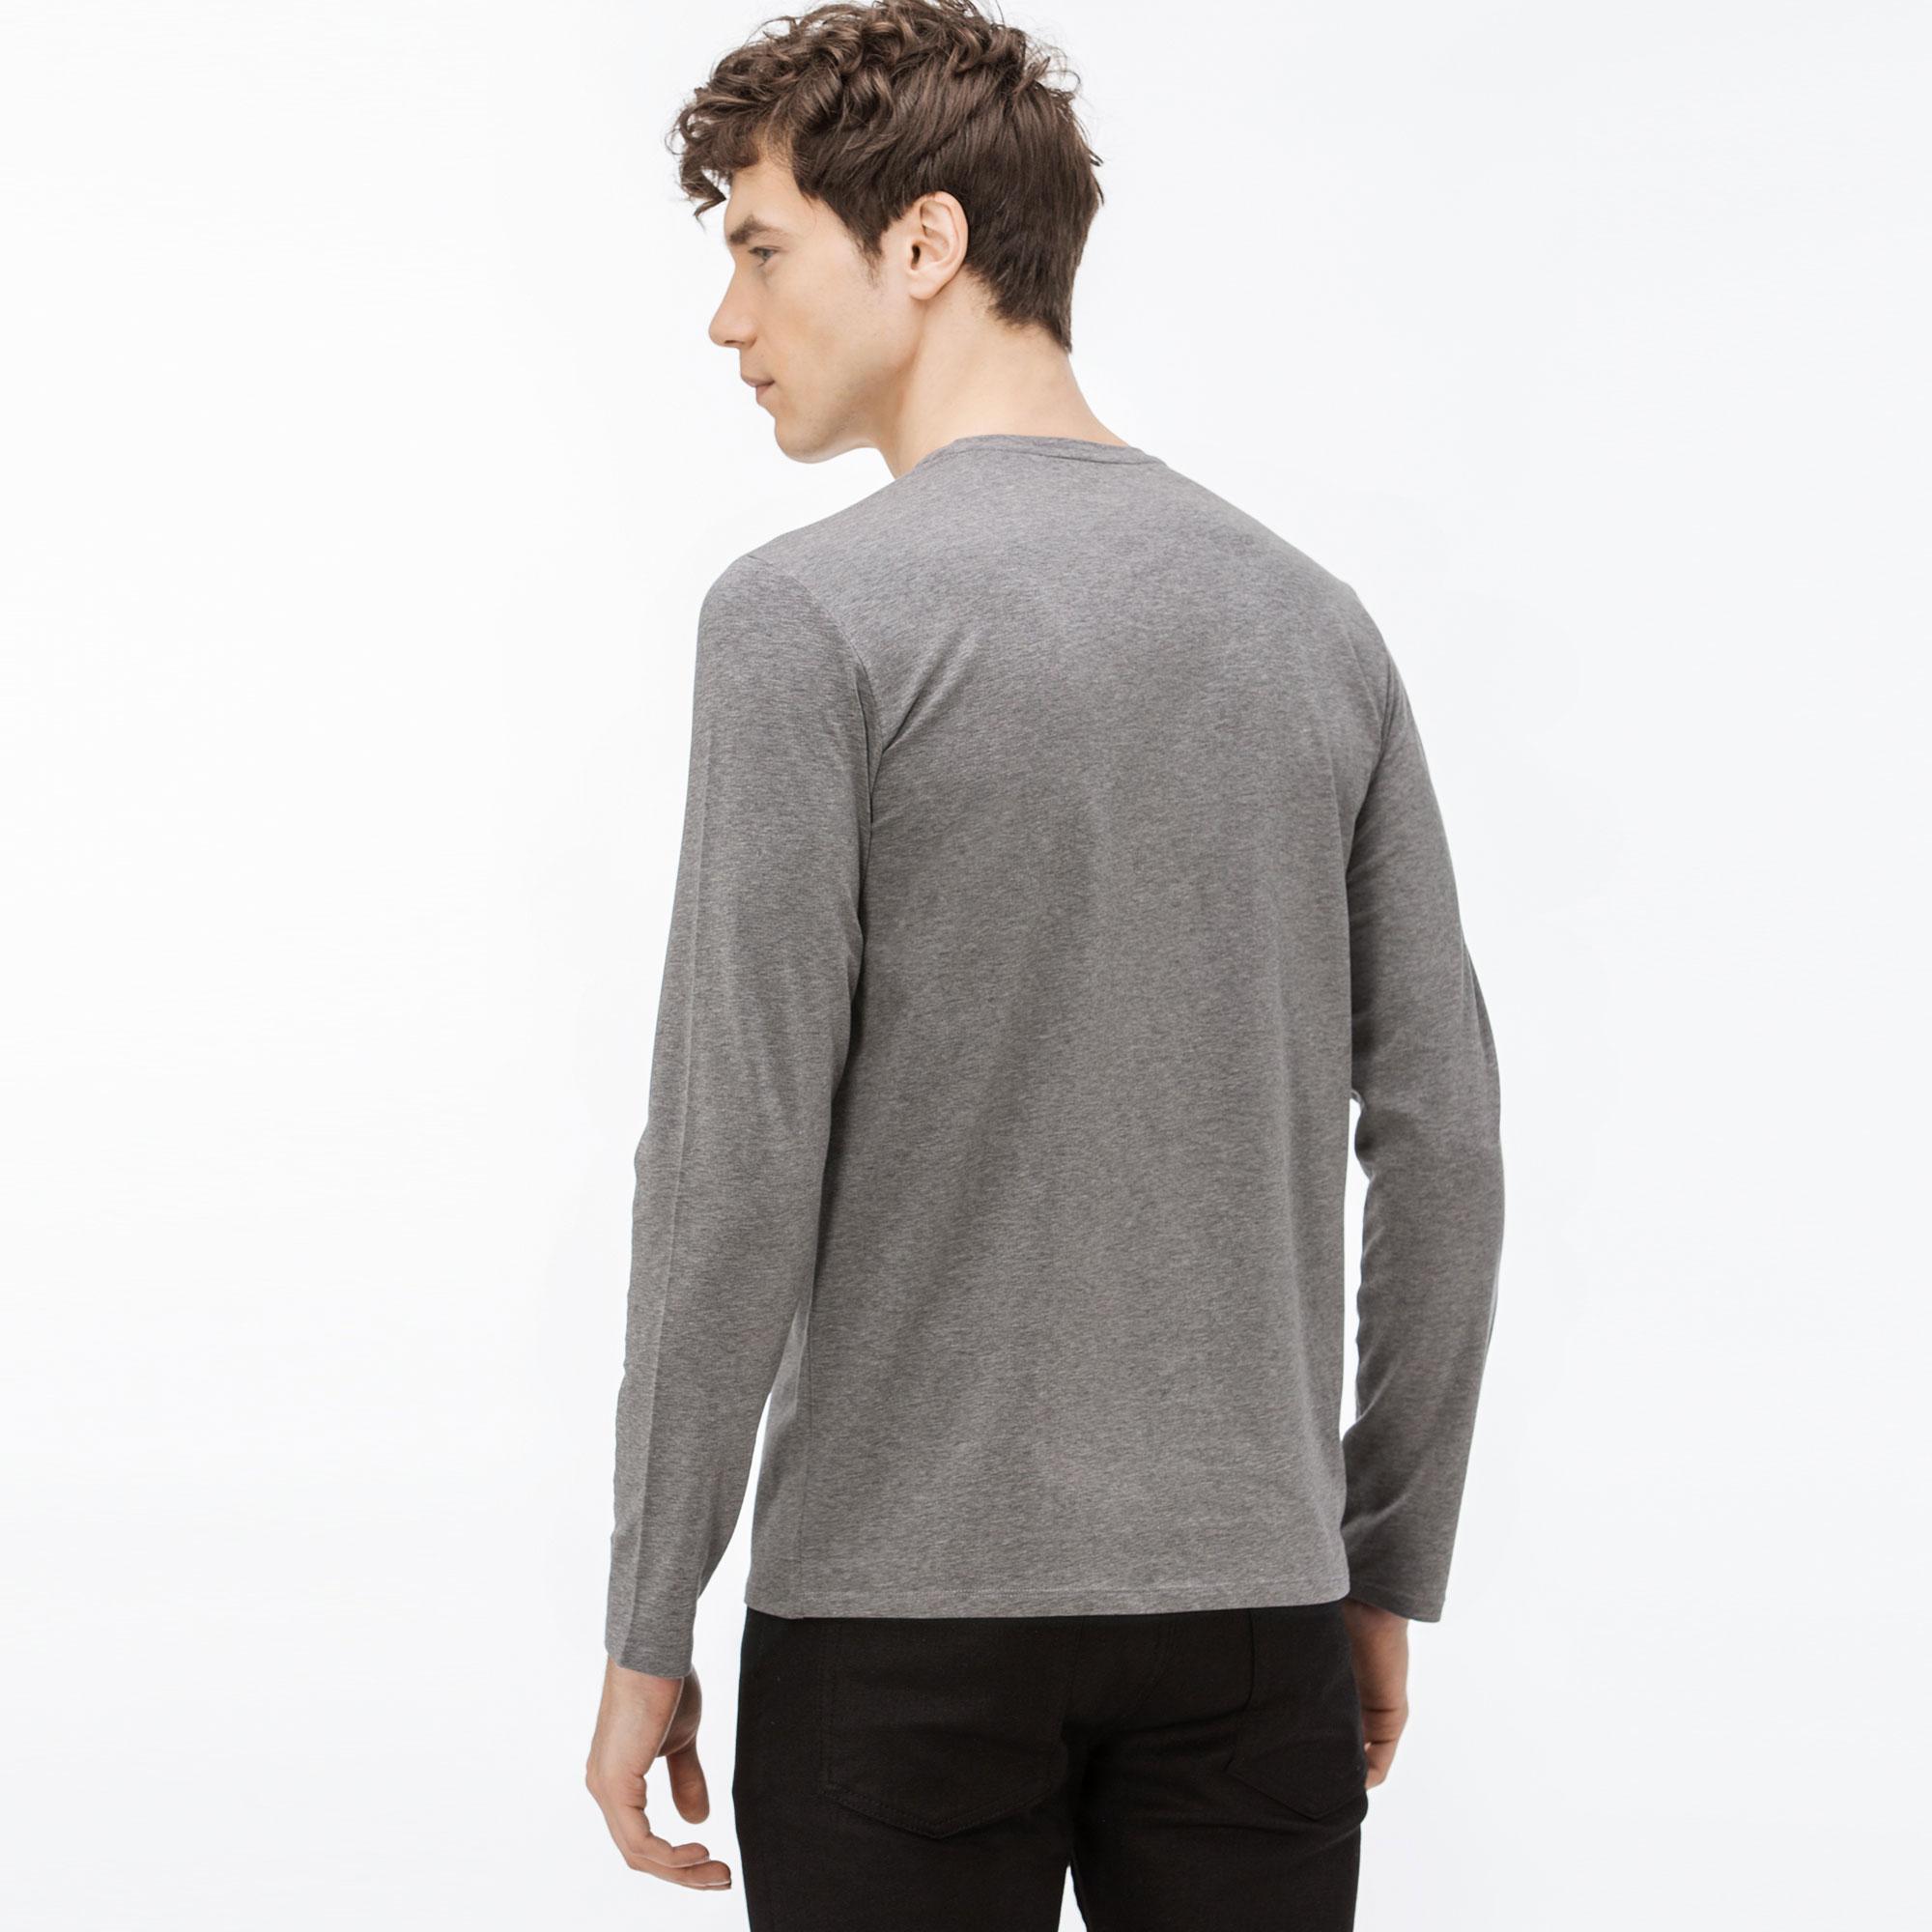 Lacoste Erkek Uzun Kollu Gri T-Shirt